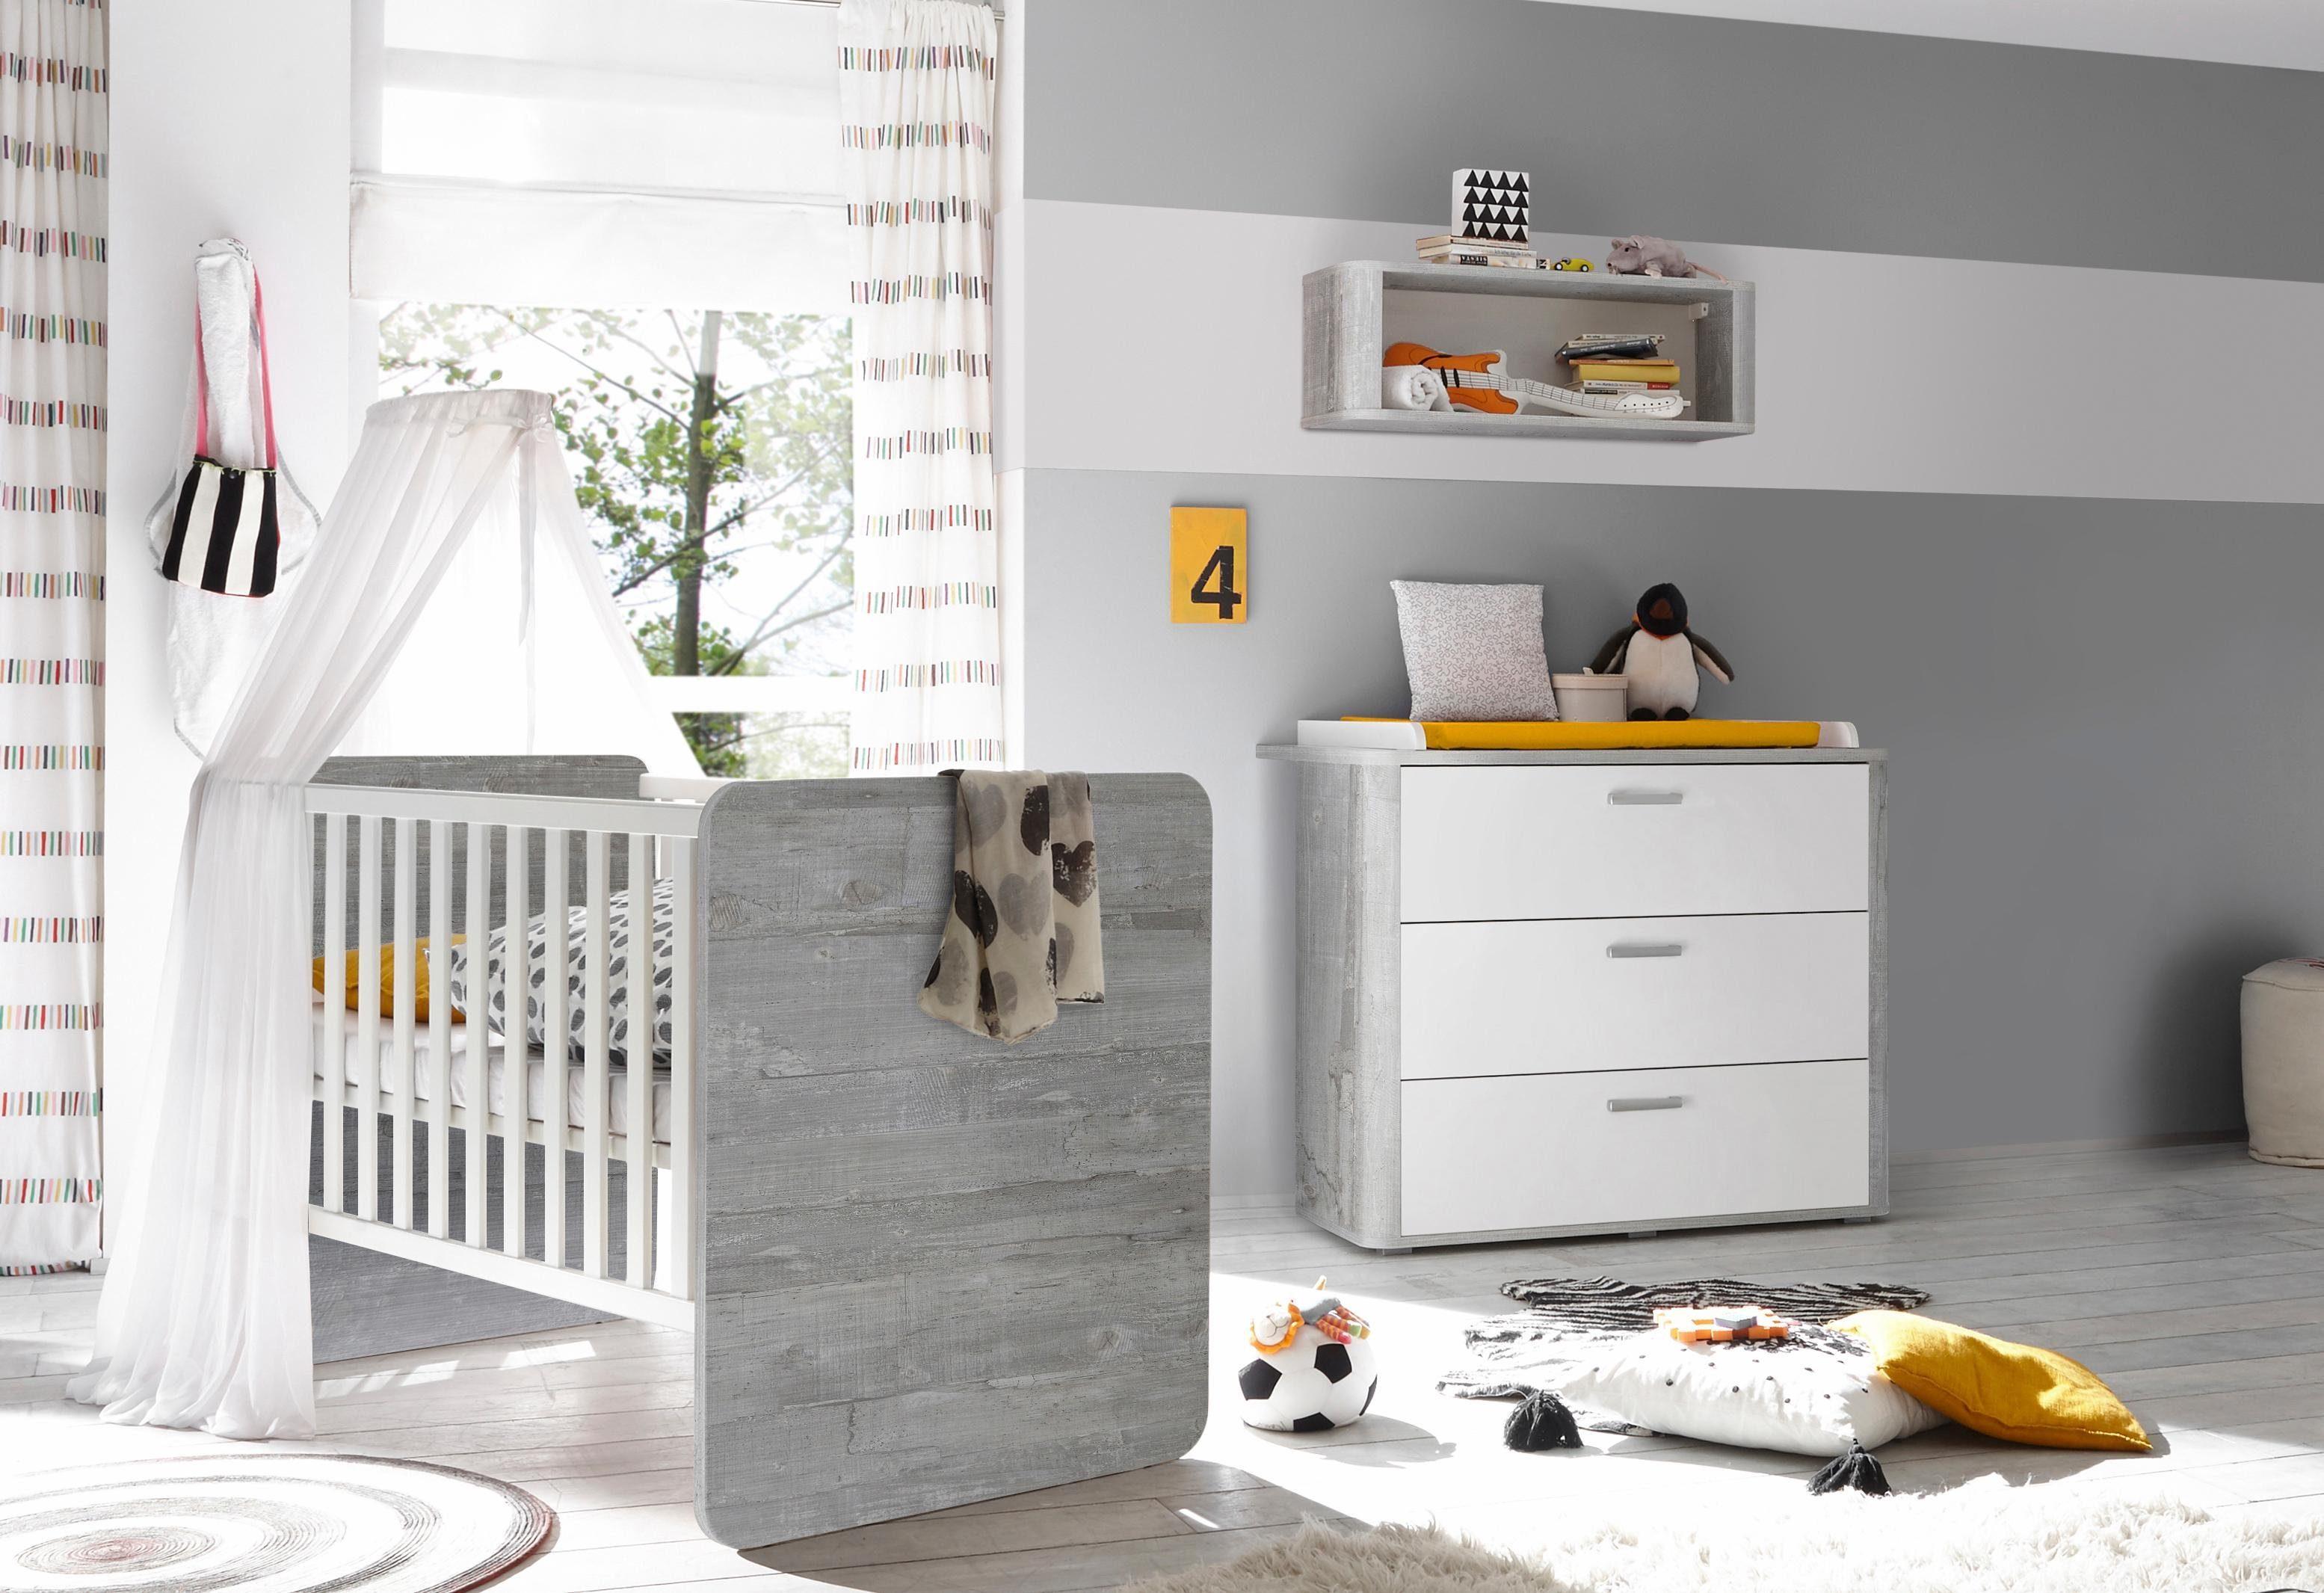 Spar-Set »Aarhus«, Babybett und Wickelkommode, 2-tlg., in vintage grau/weiß matt Lack